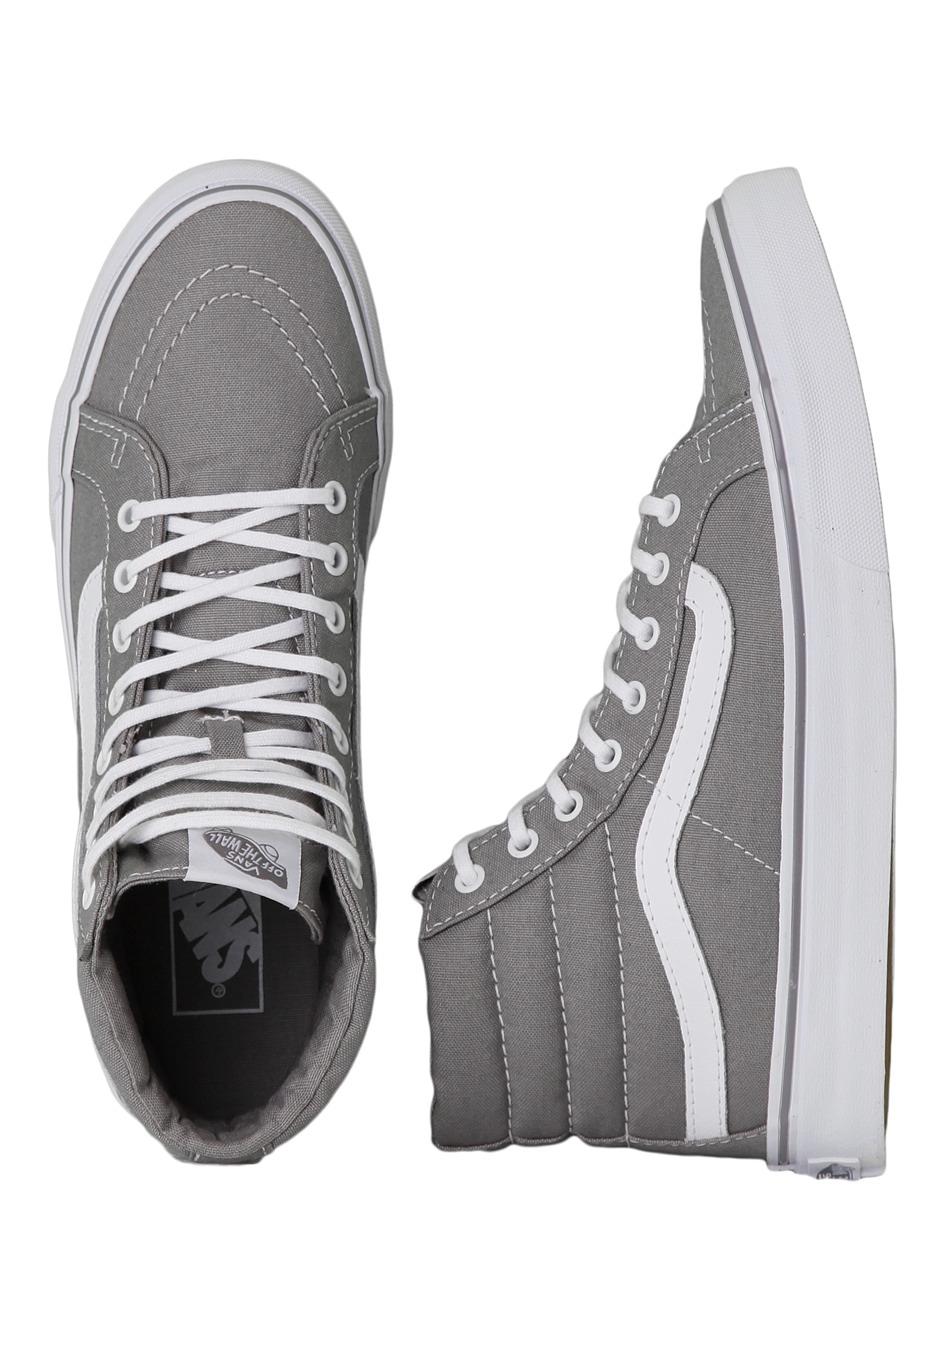 458f7b4c564dff Vans - SK8-Hi Slim Frost Grey True White - Girl Shoes .